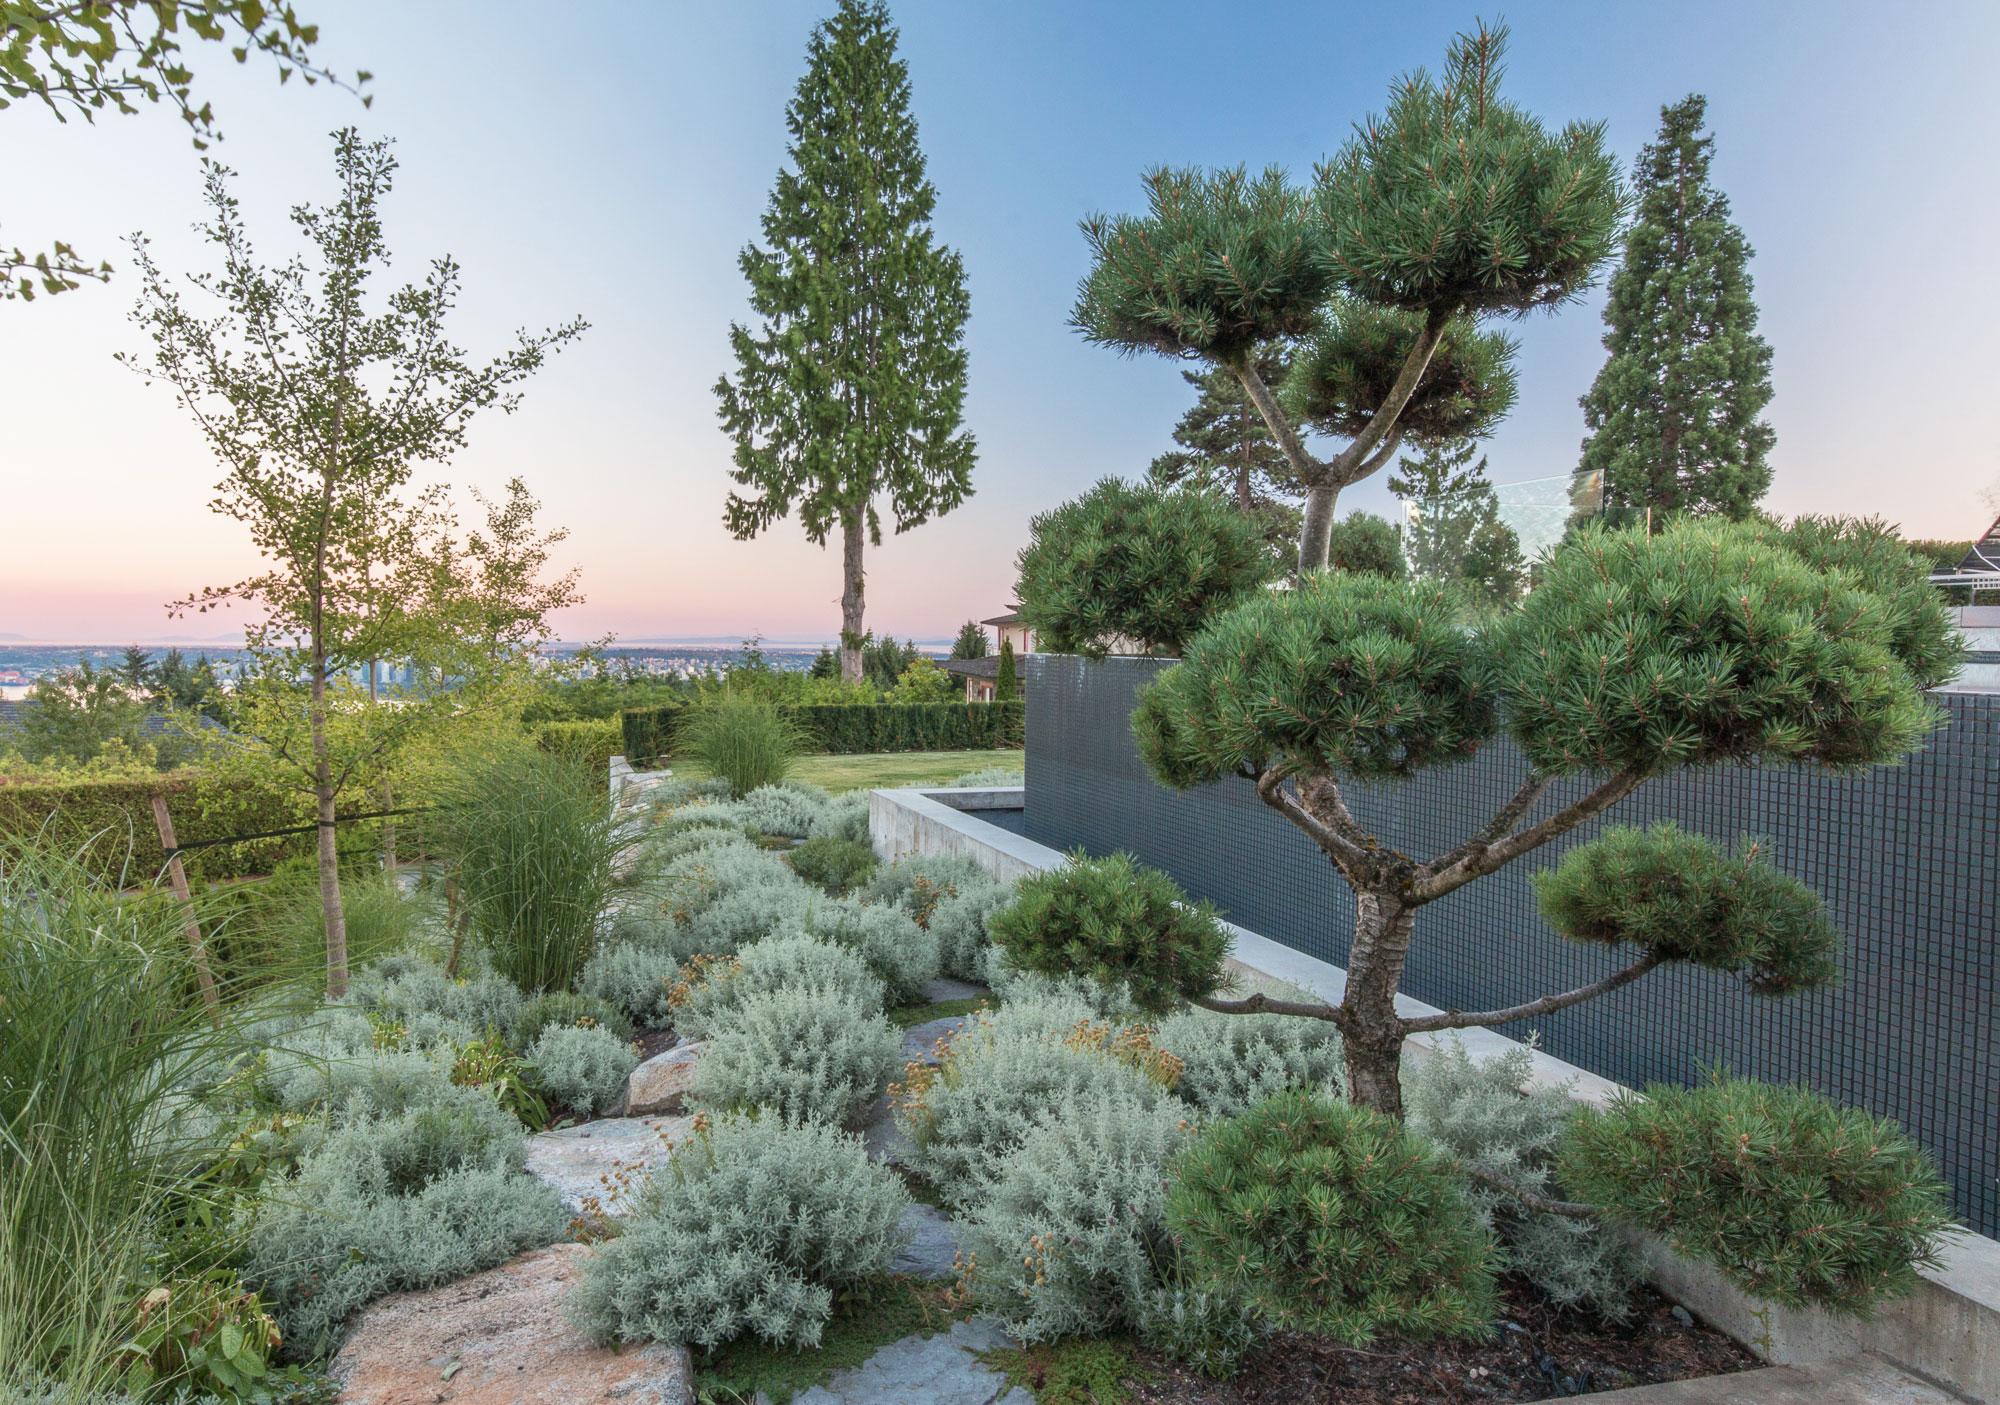 Groveland   Botanica Design   Photo by: Hank White